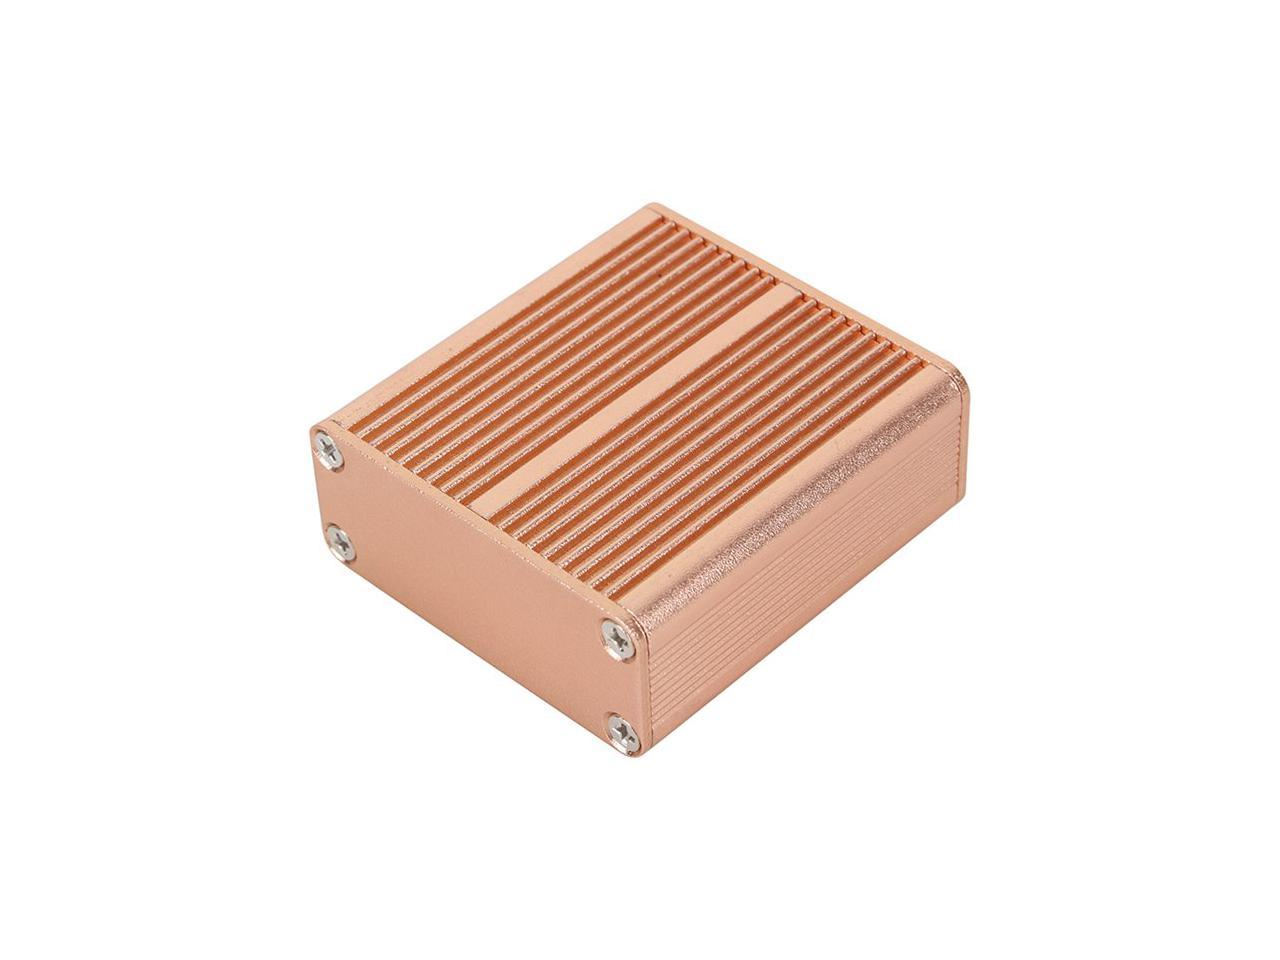 DIY PCB Instrument Aluminum Box 50*58*24mm Enclosure Case Project electronicZJP